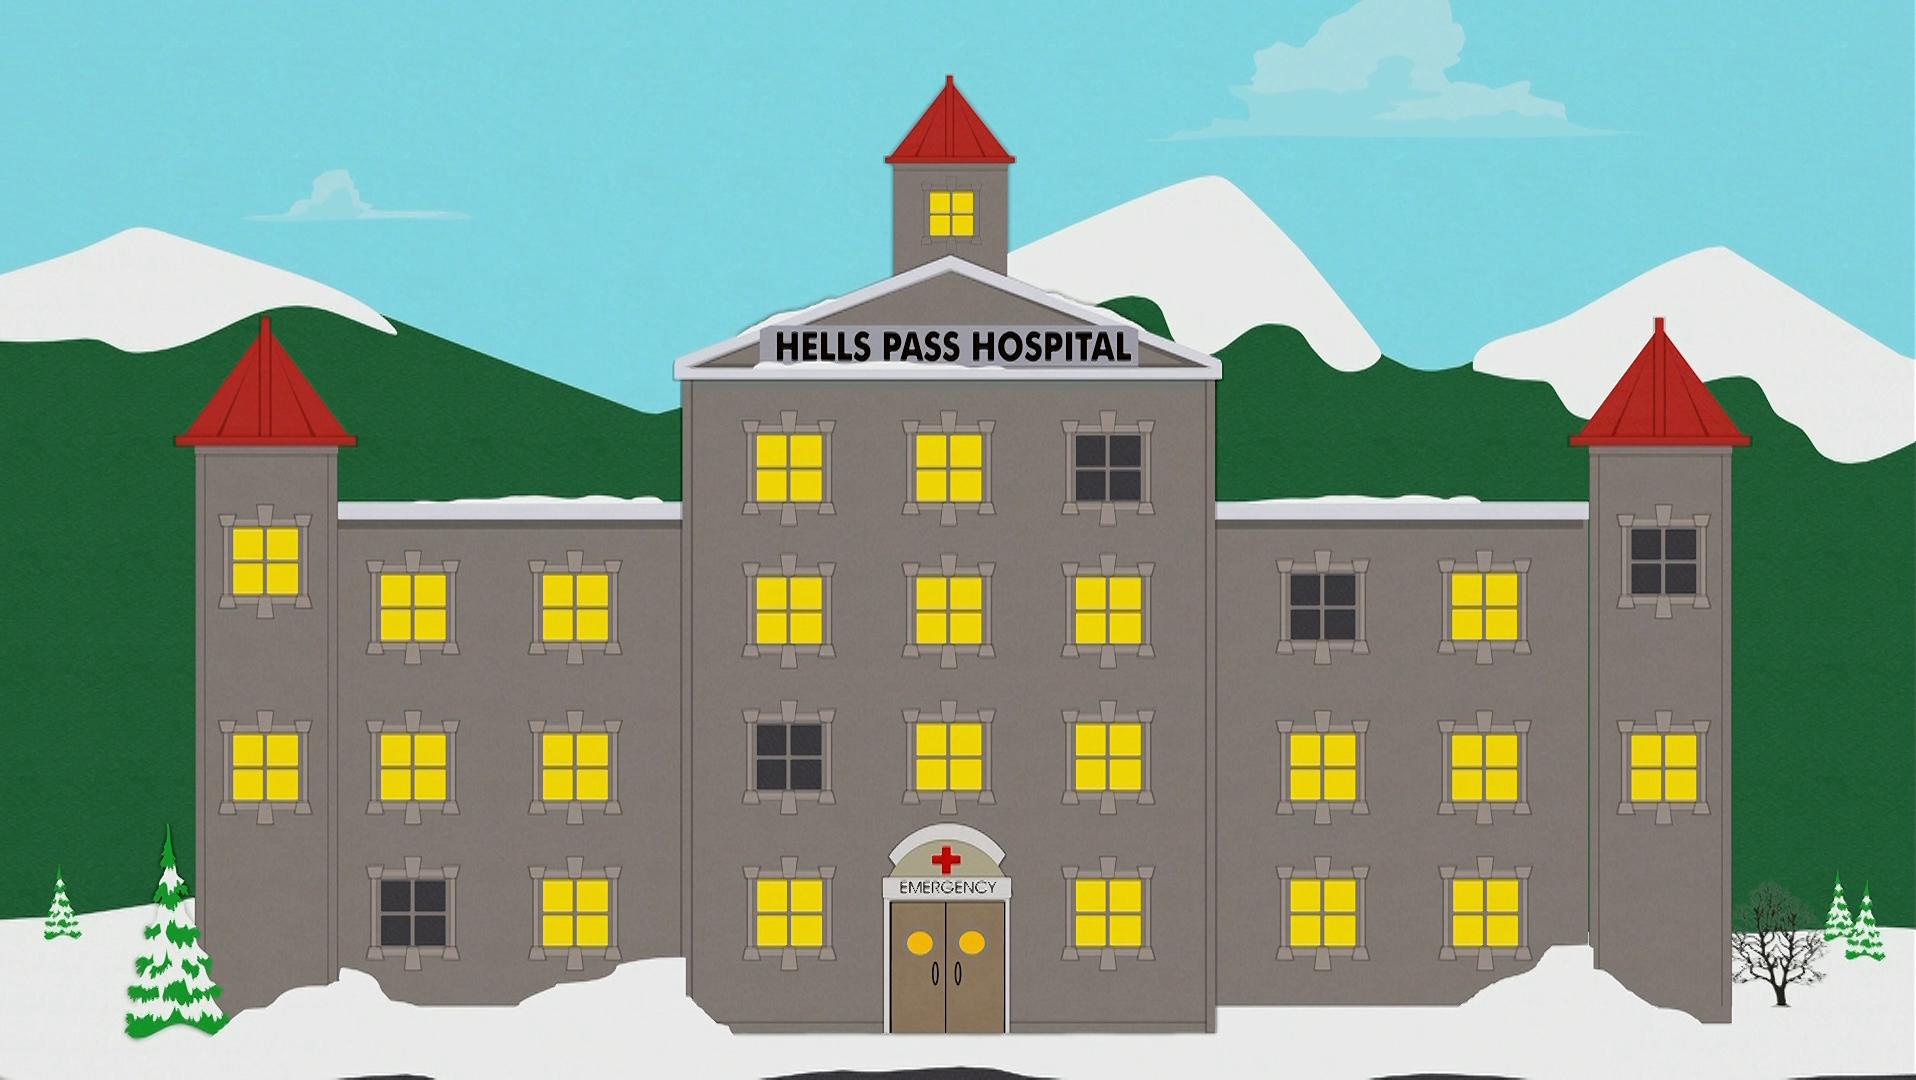 Hell's Pass Hospital